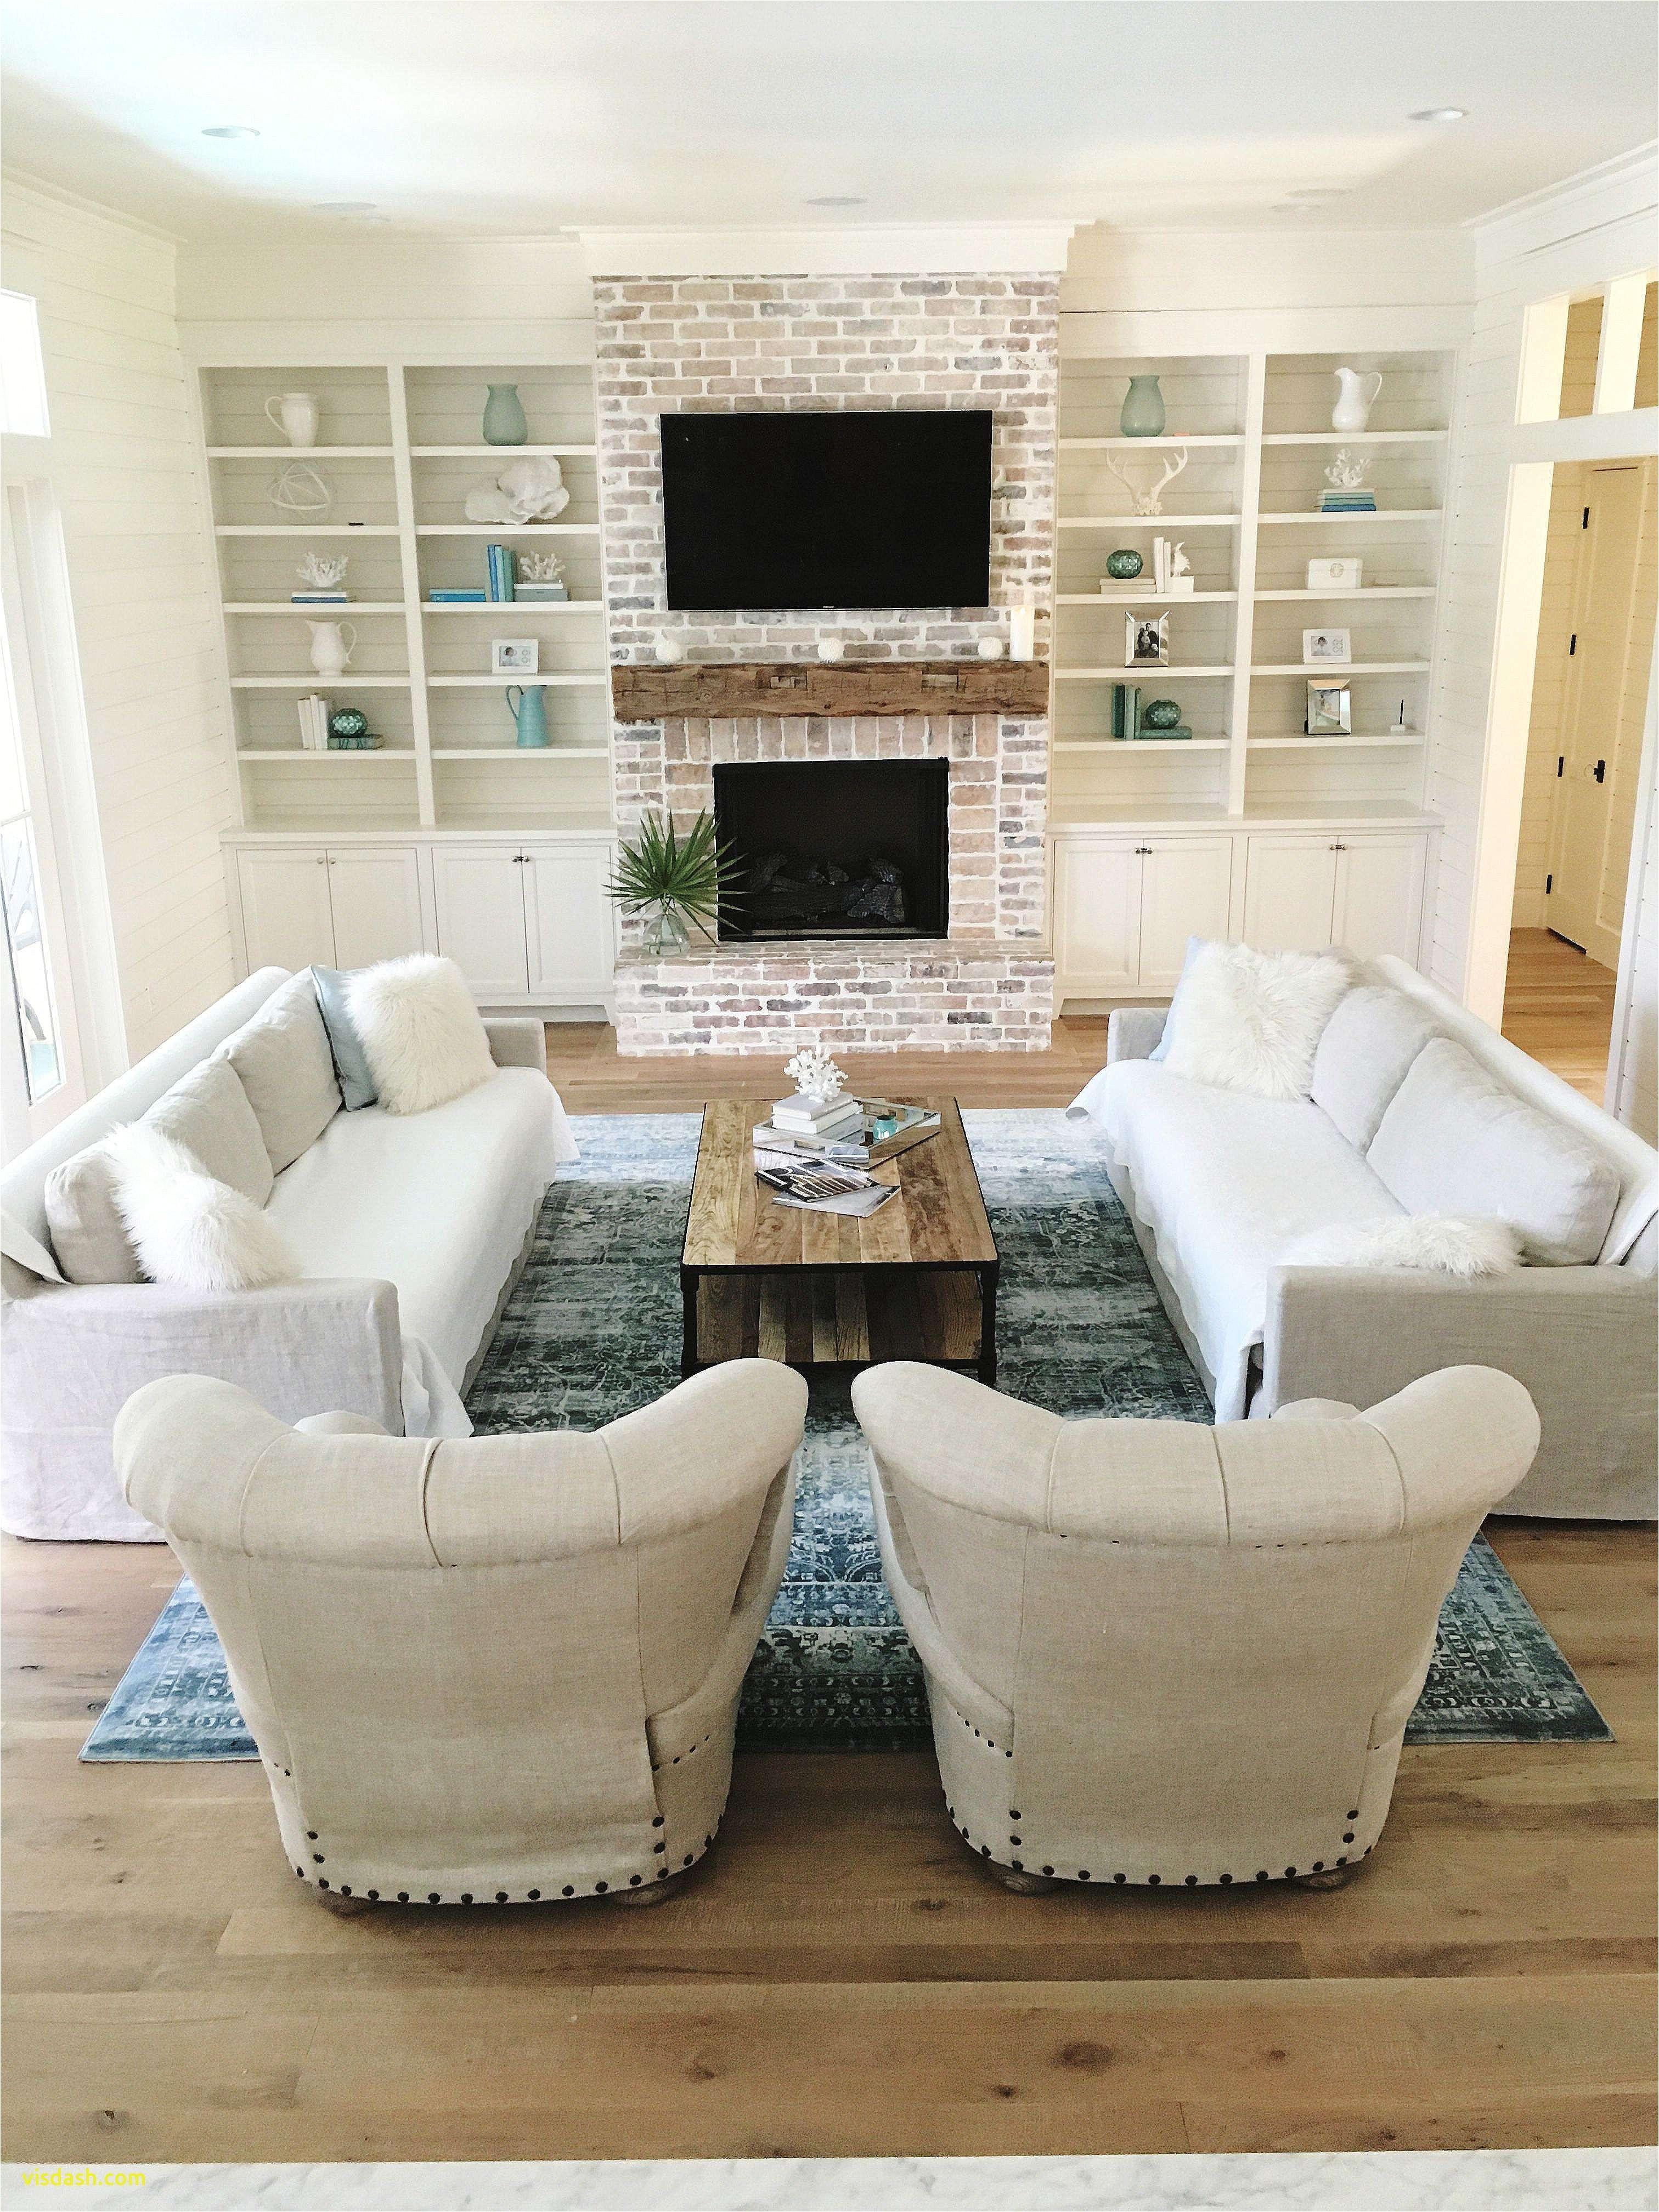 modern living room furniture new gunstige sofa macys furniture 0d scheme modern home decorating